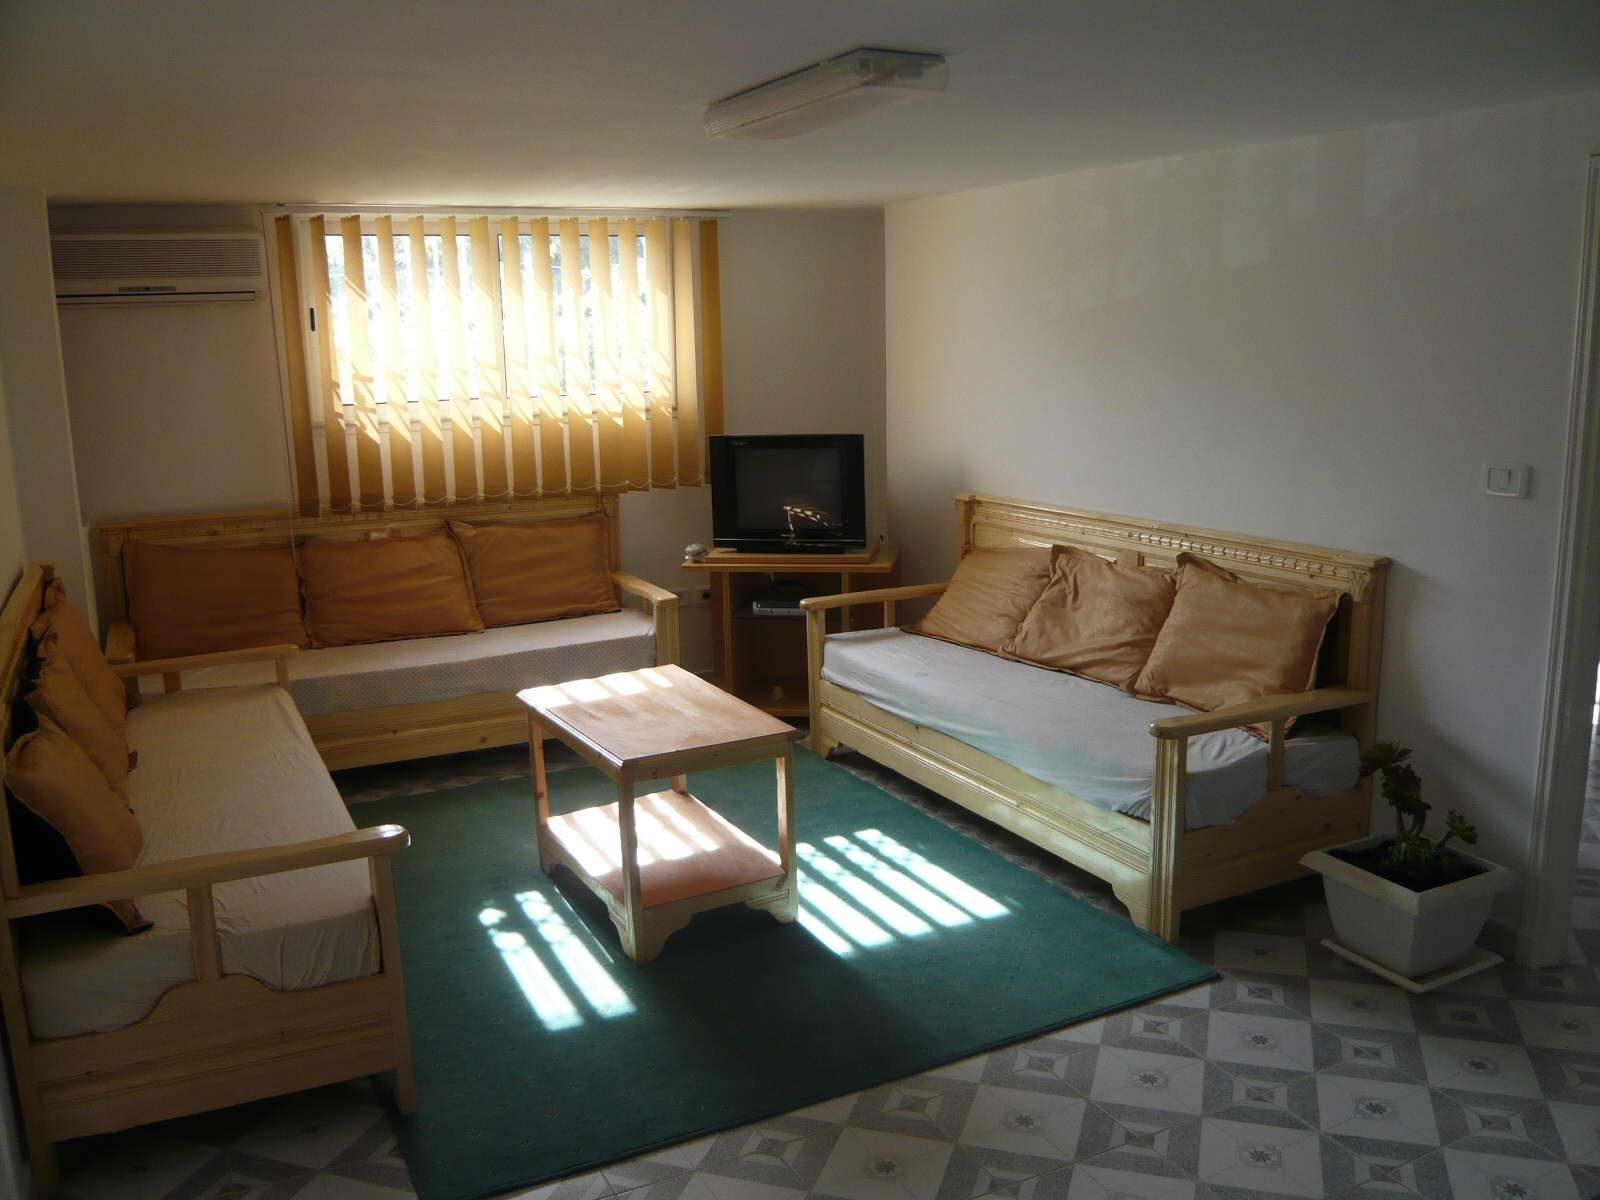 location appartement s+1 tunis